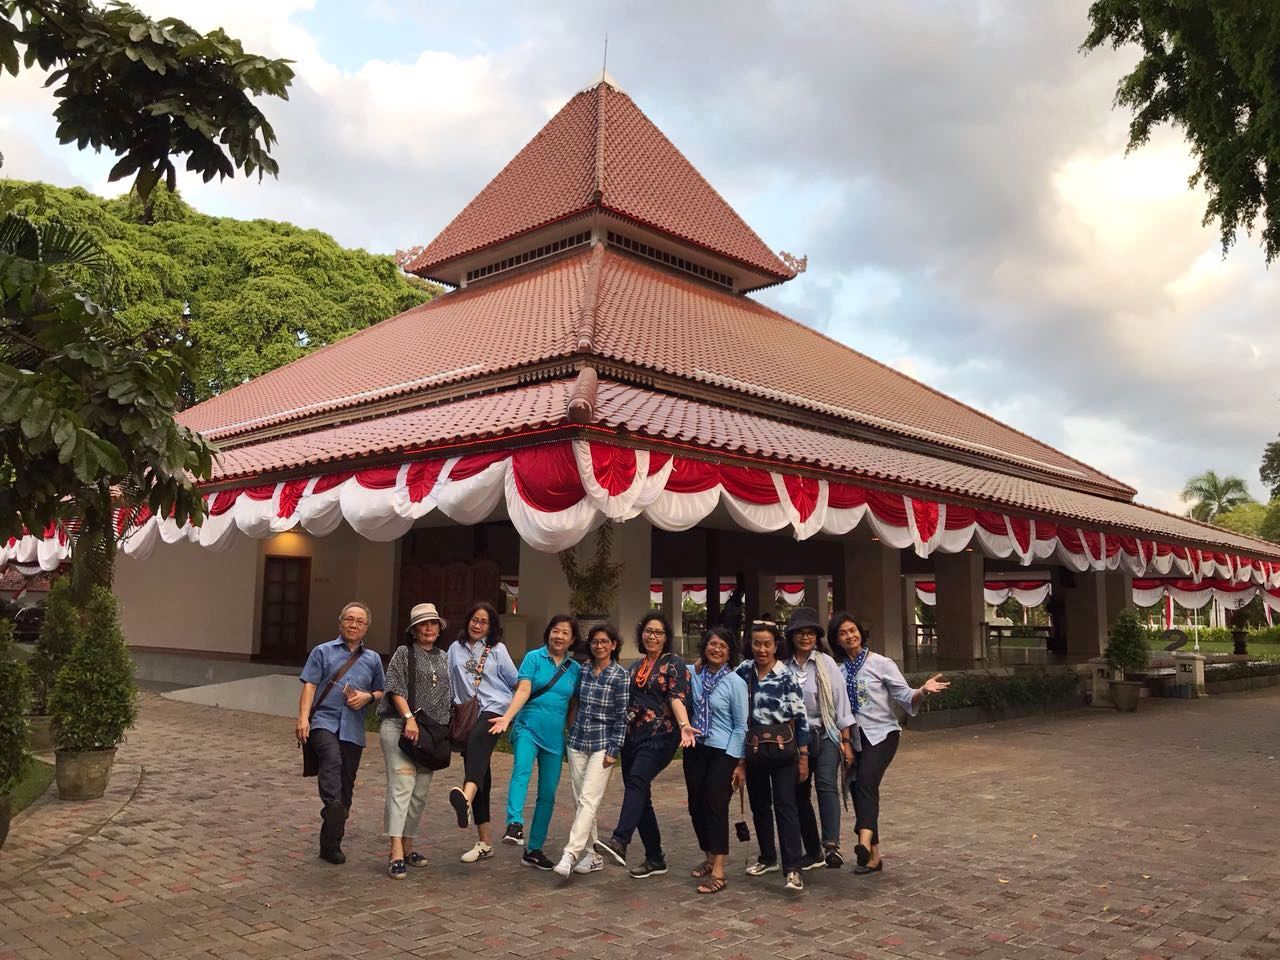 paket wisata banyuwangi 3h2m, banyuwangi city tour